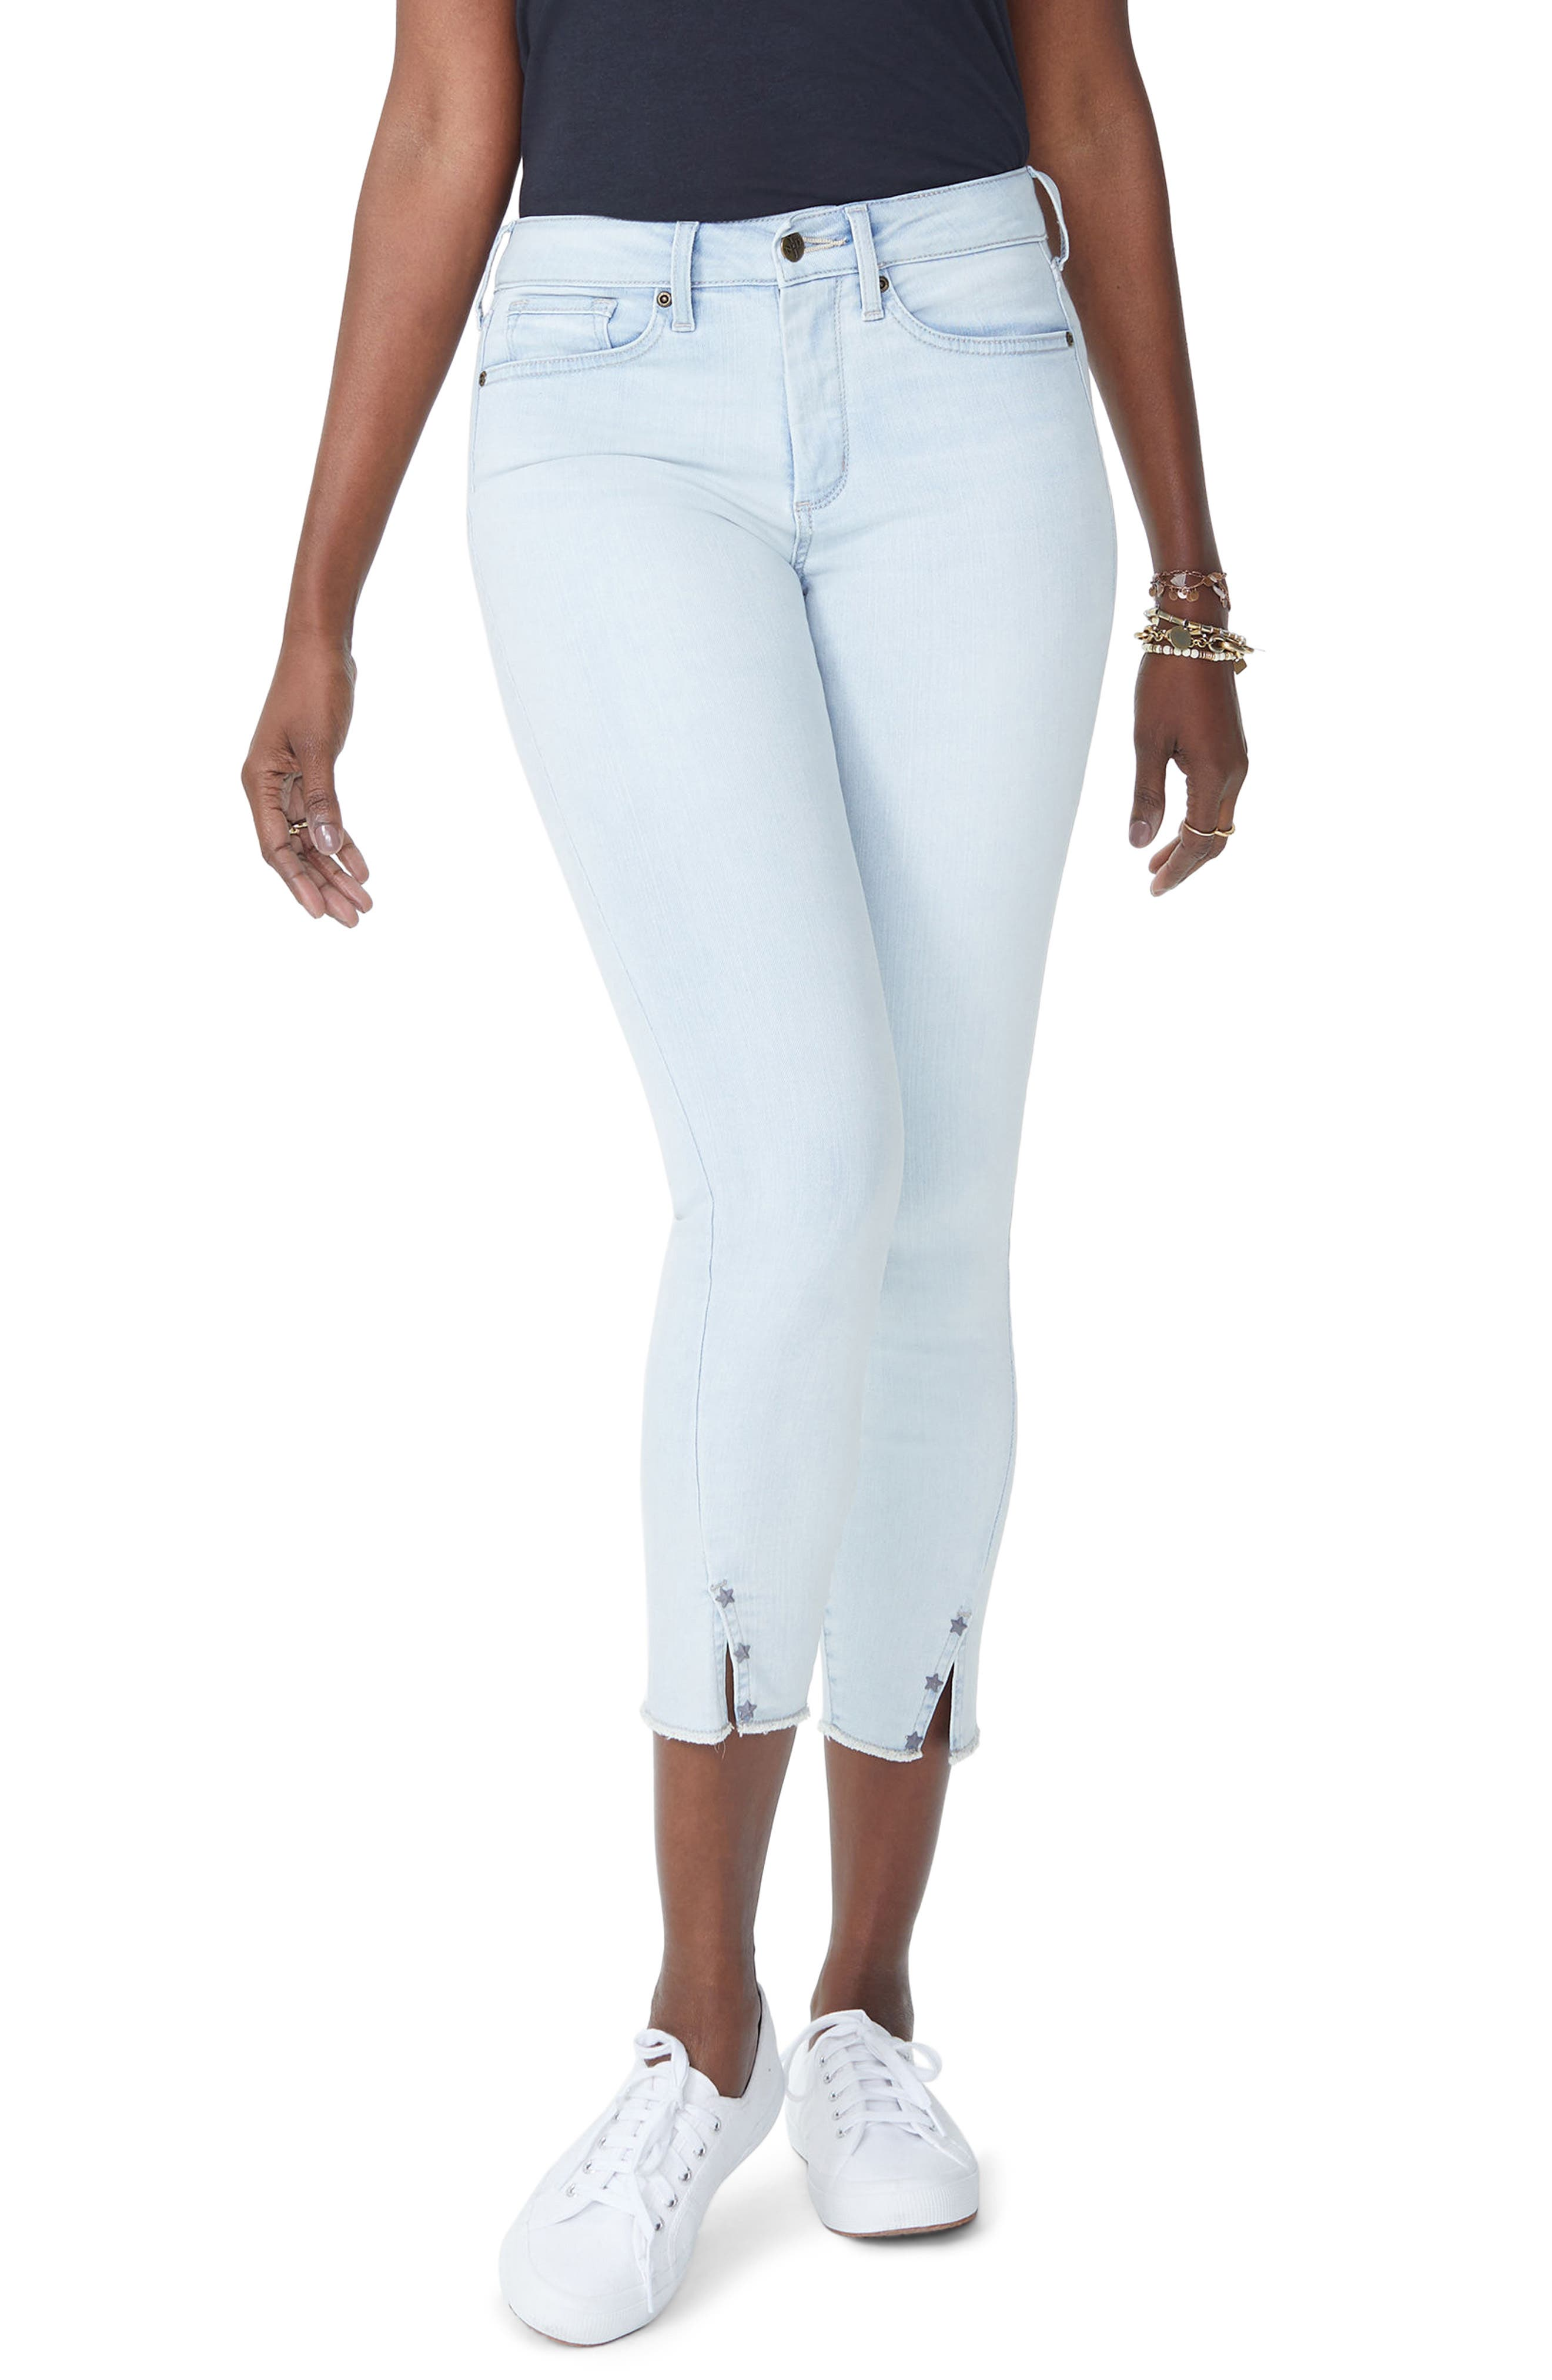 Ami High Waist Twist Seam Stretch Ankle Skinny Jeans,                             Main thumbnail 1, color,                             PALM DESERT